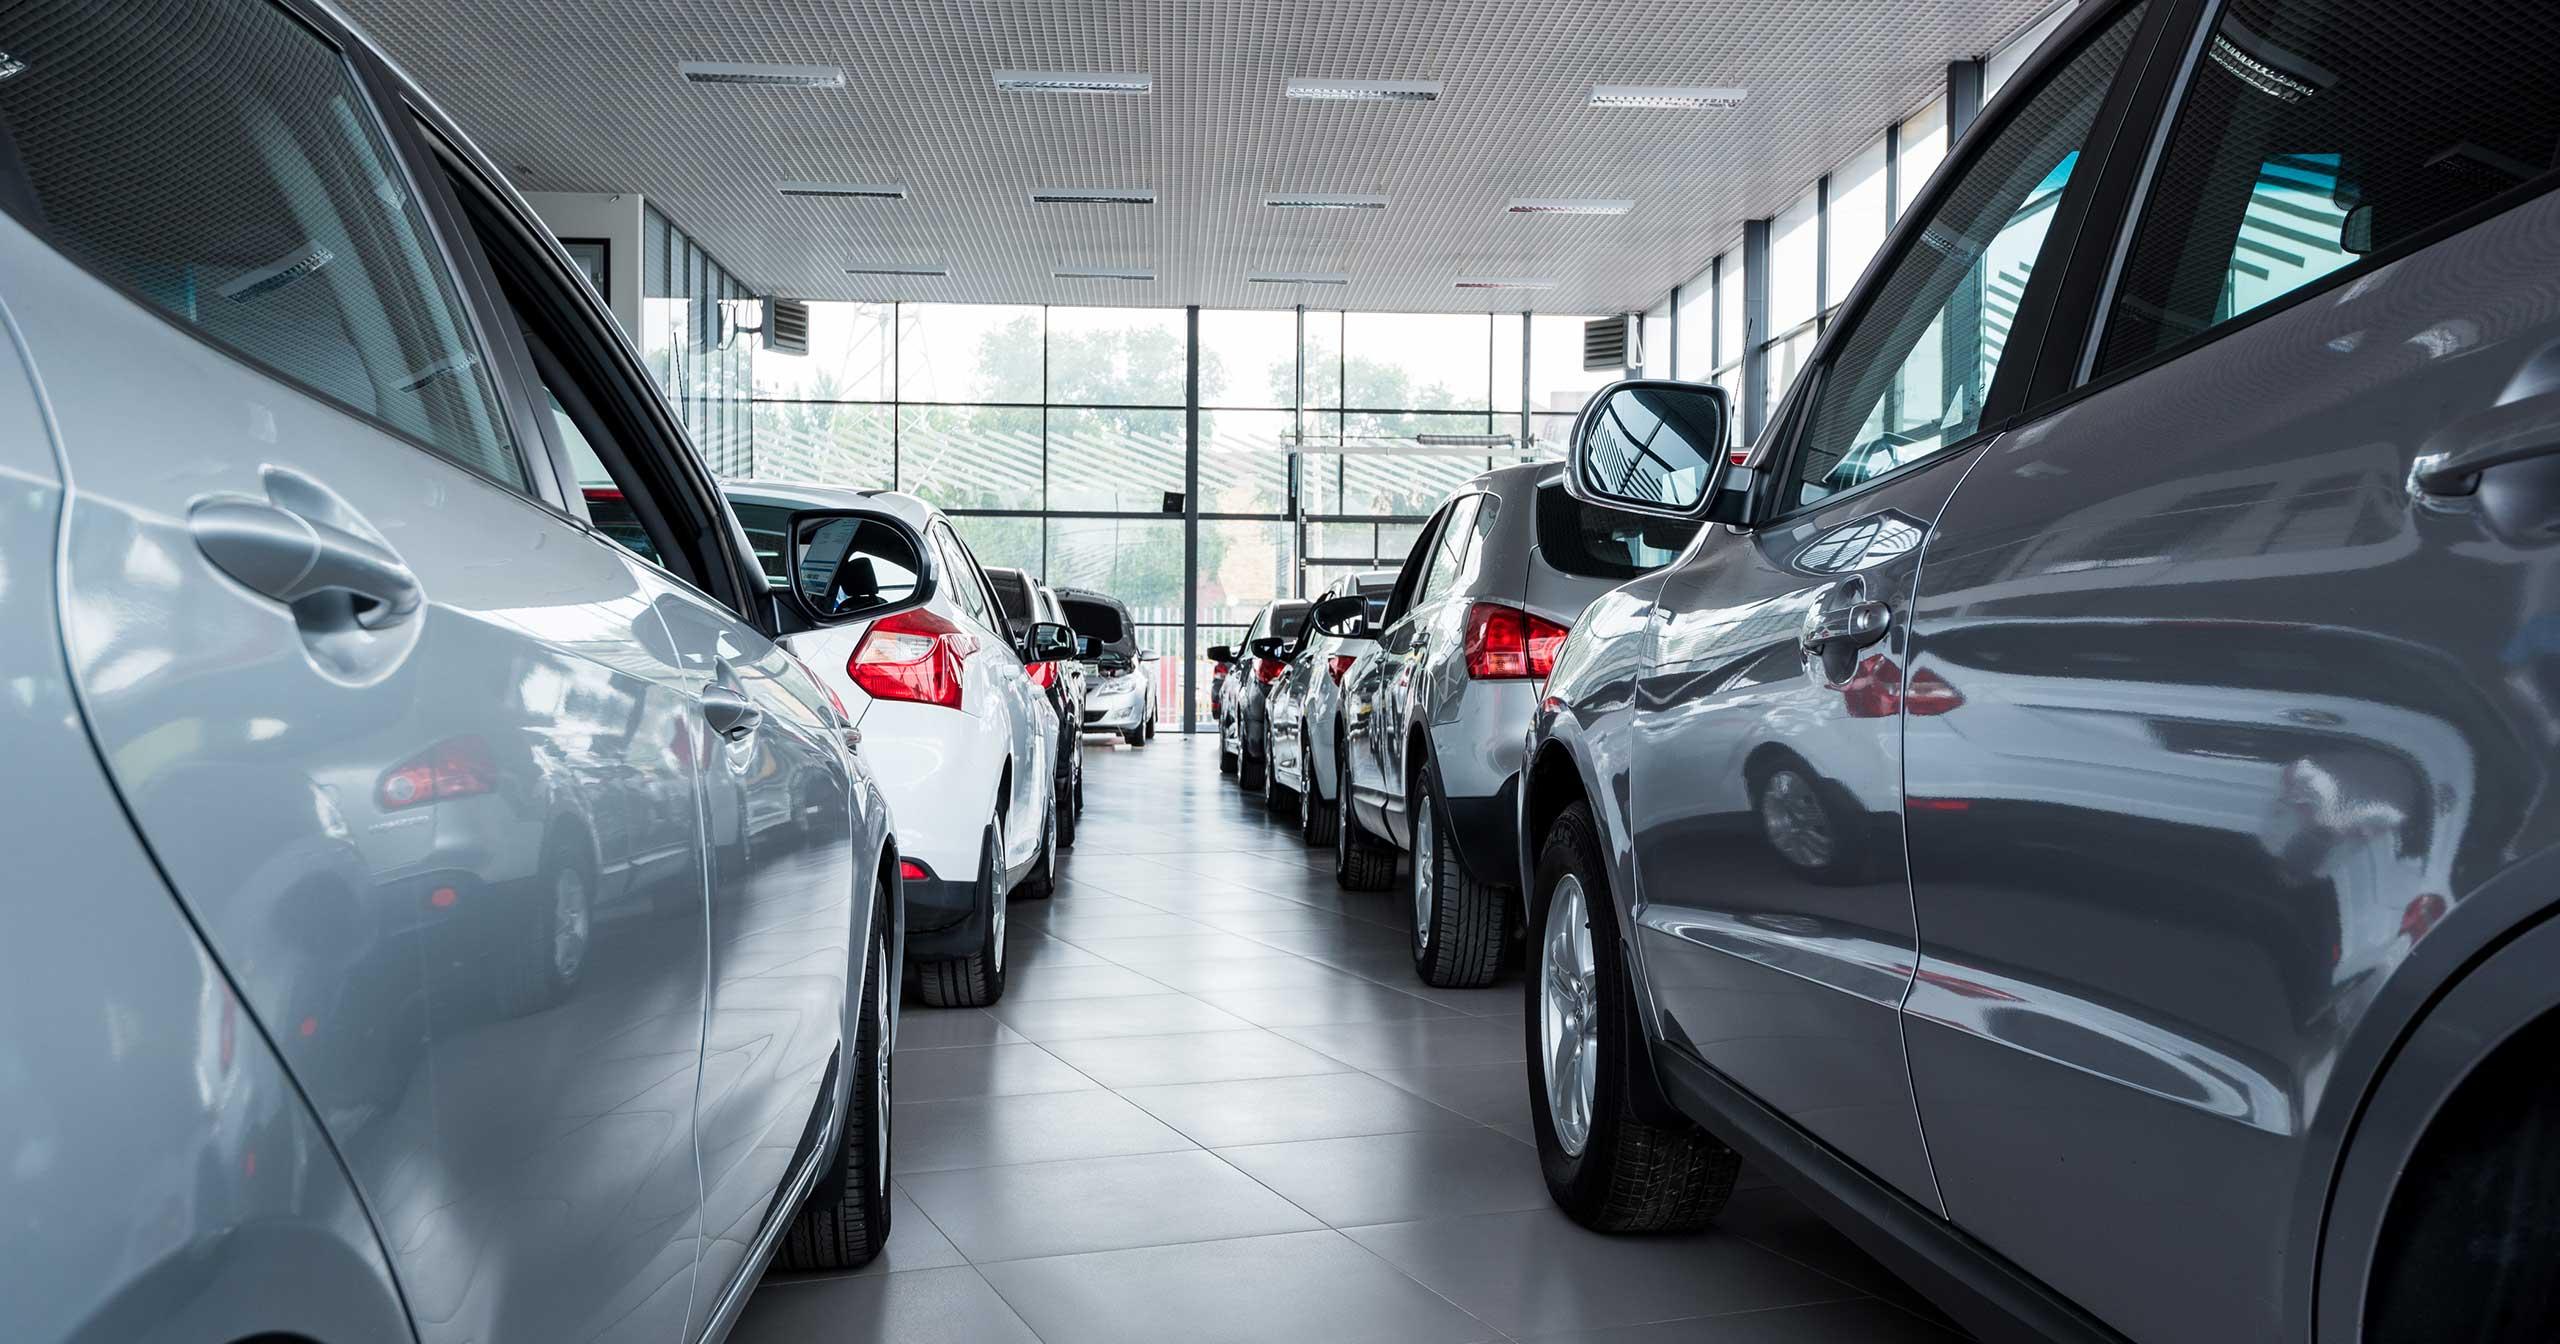 2018 Consumer Survey of Automotive Finance Perceptions United Kingdom